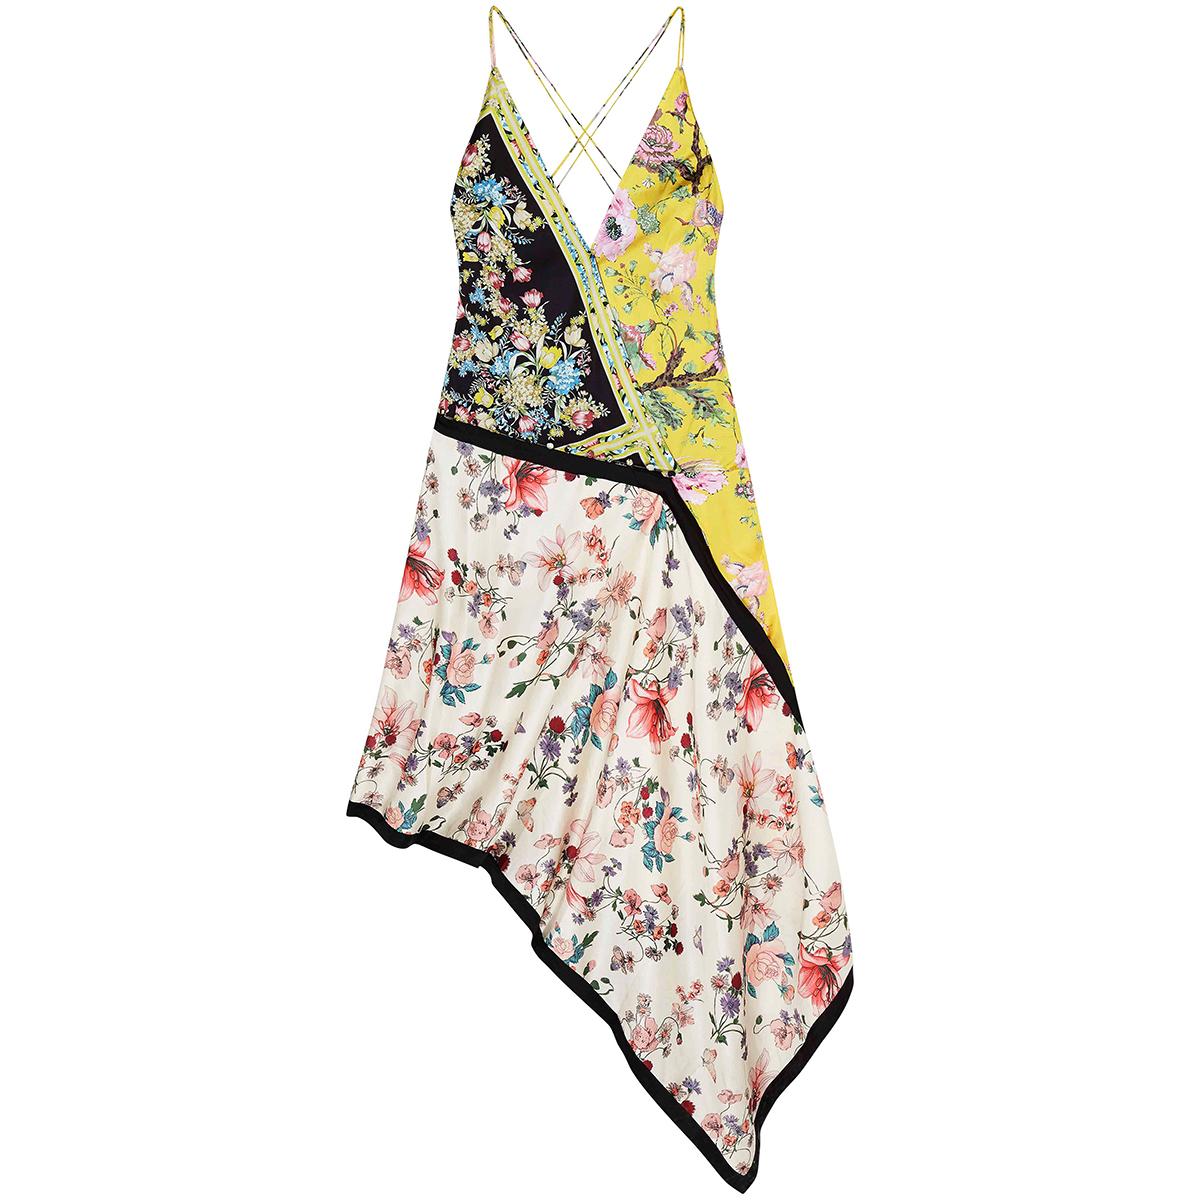 ASOS design mixed floral print asymmetrical dress